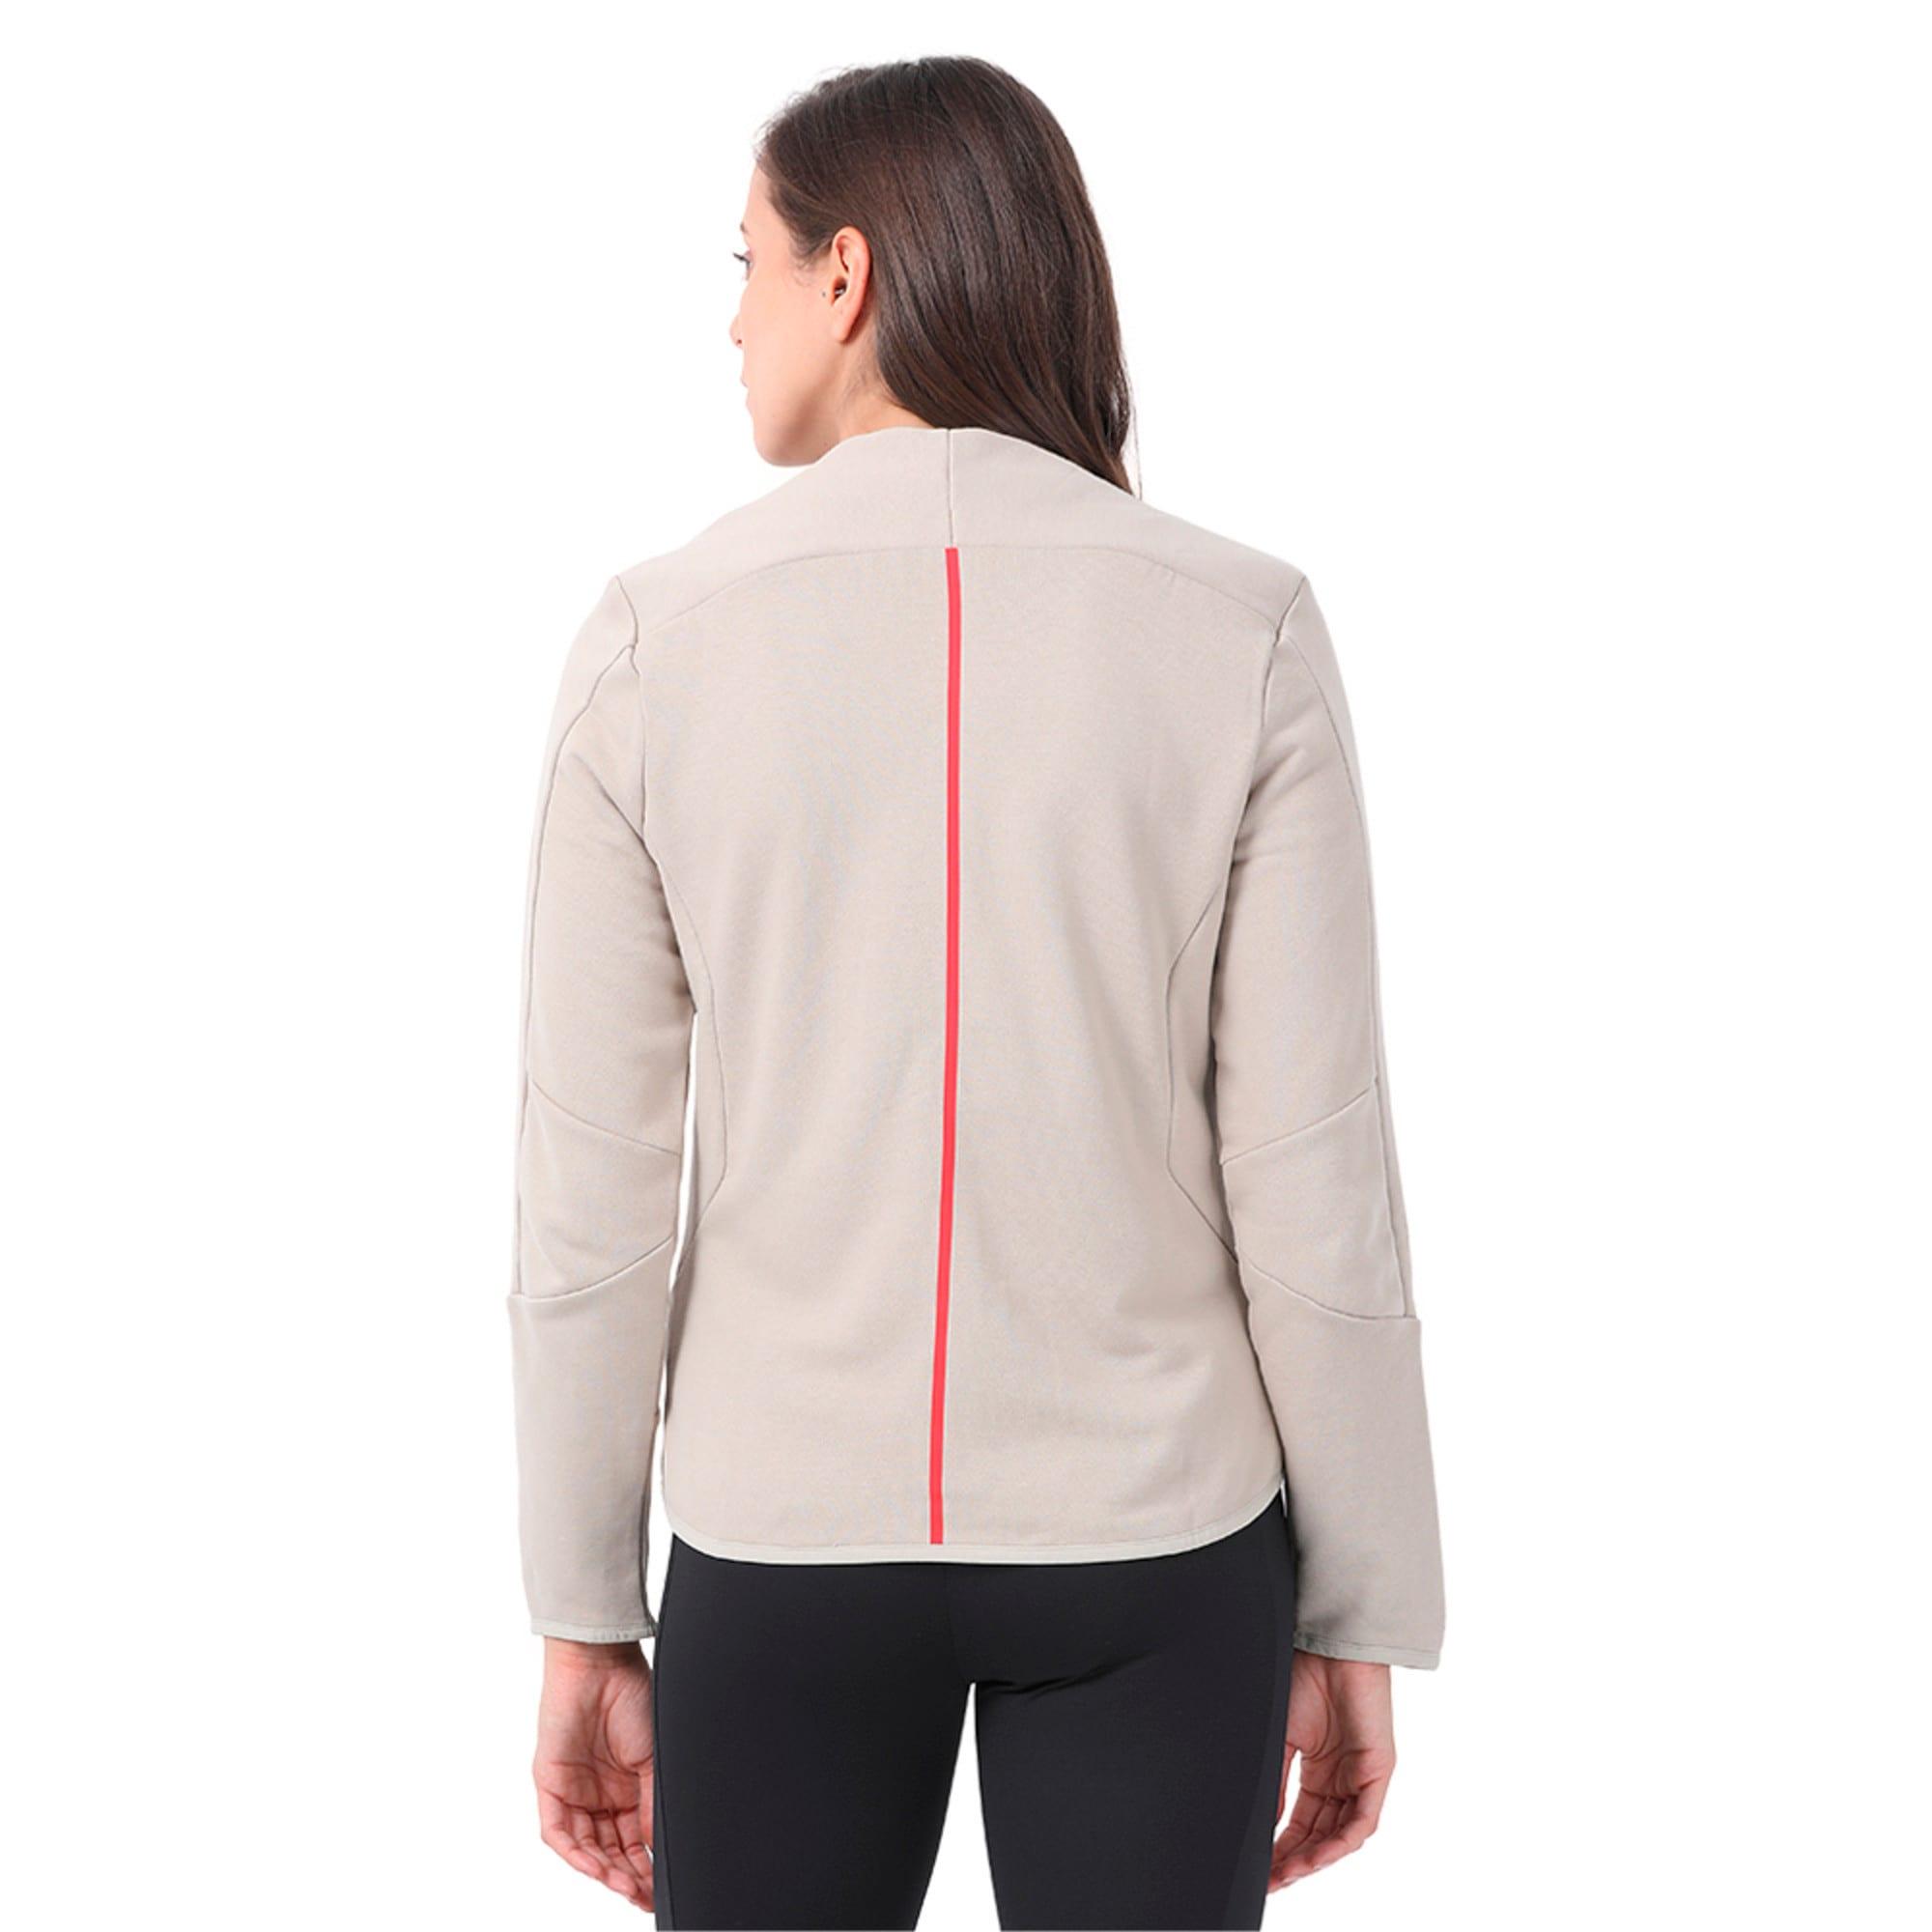 Thumbnail 2 of Ferrari Lifestyle Women's T7 Sweat Jacket, Pure Cashmere, medium-IND